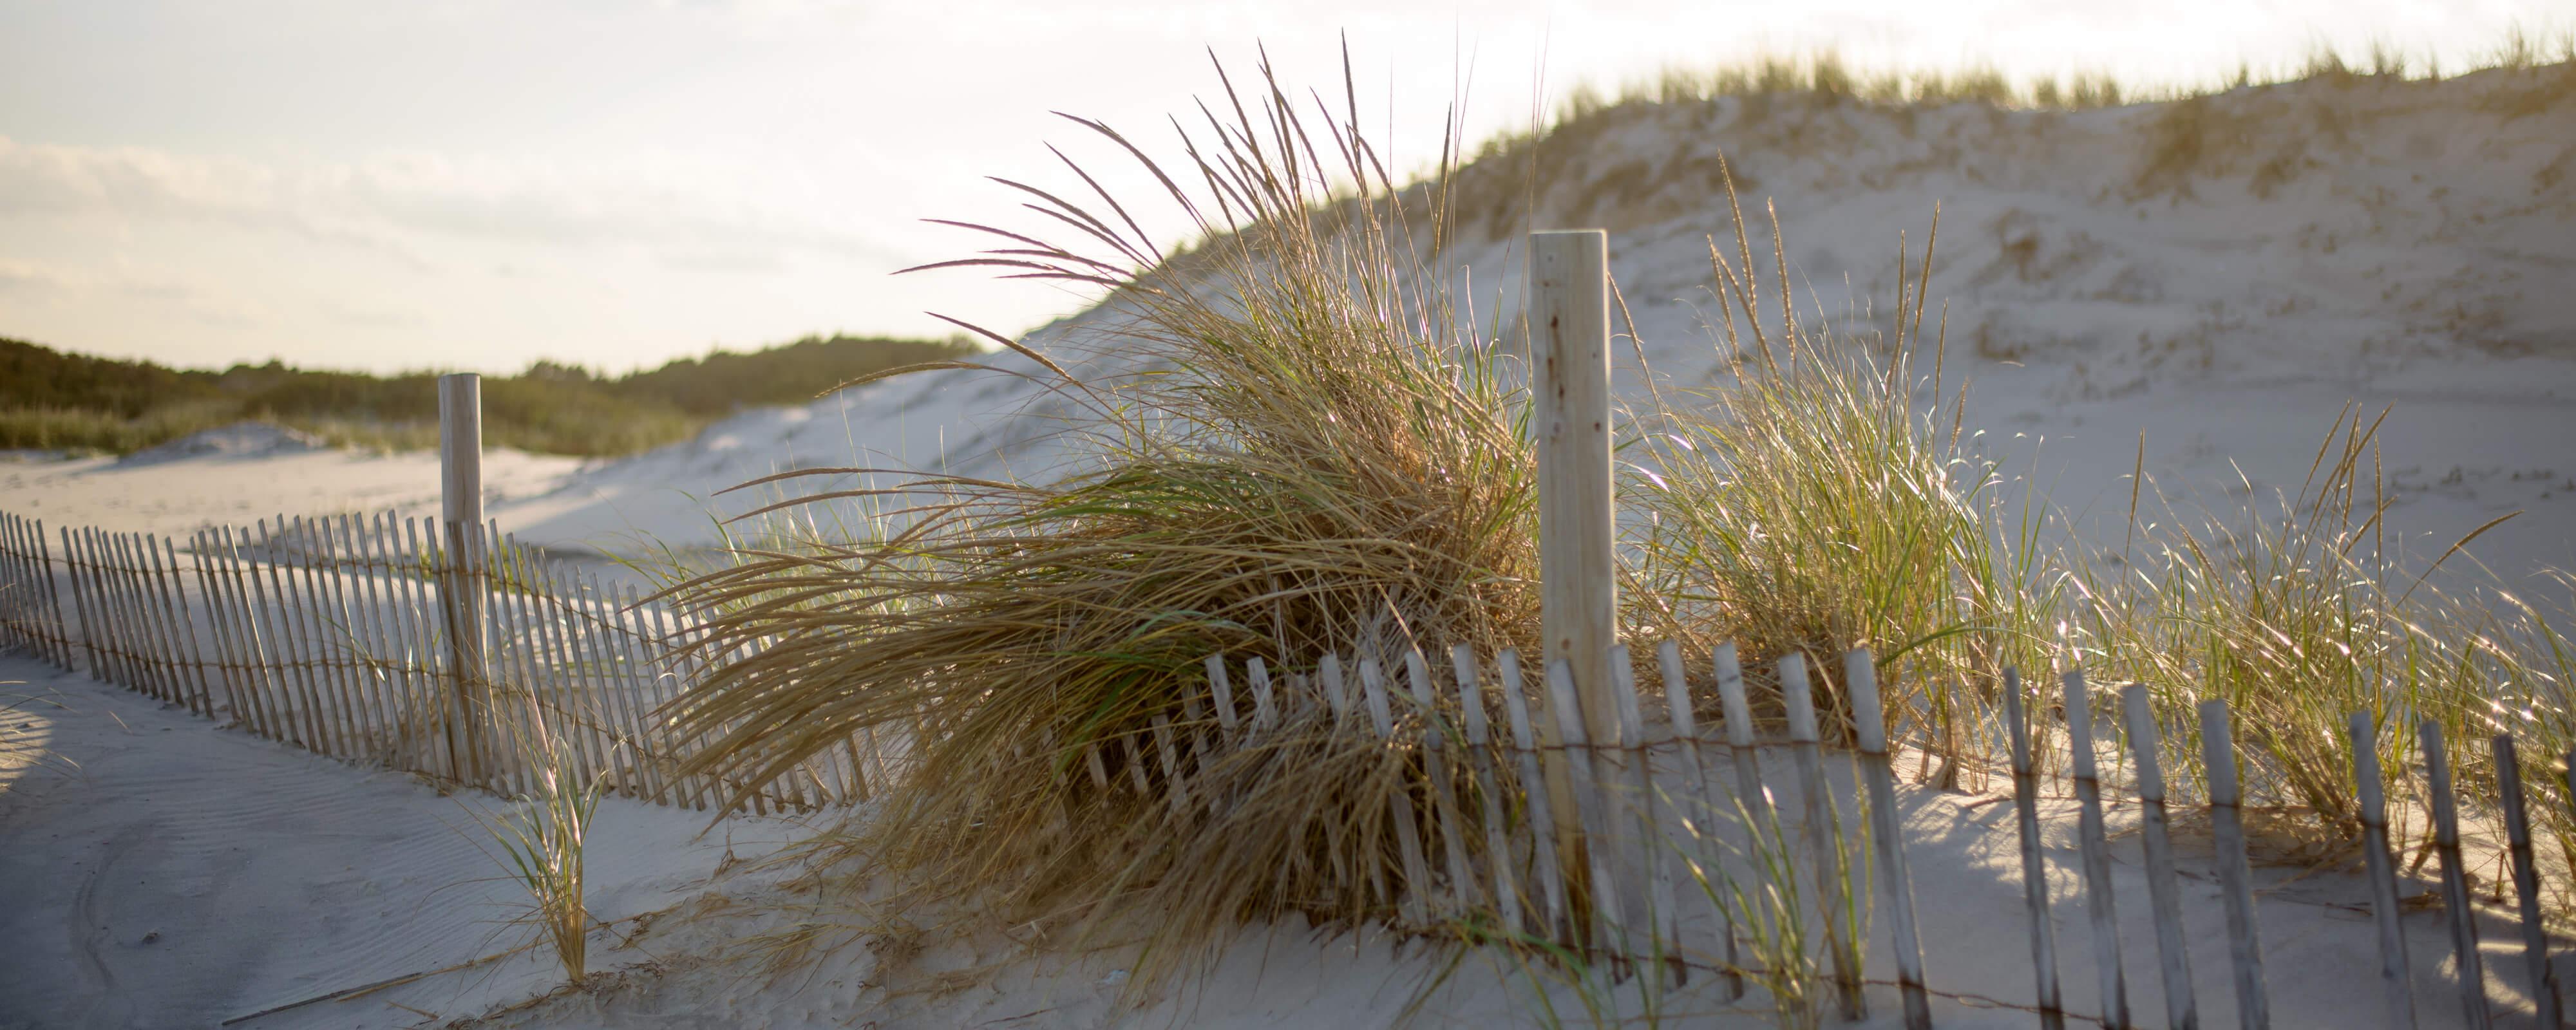 Dunes along the Jersey shore